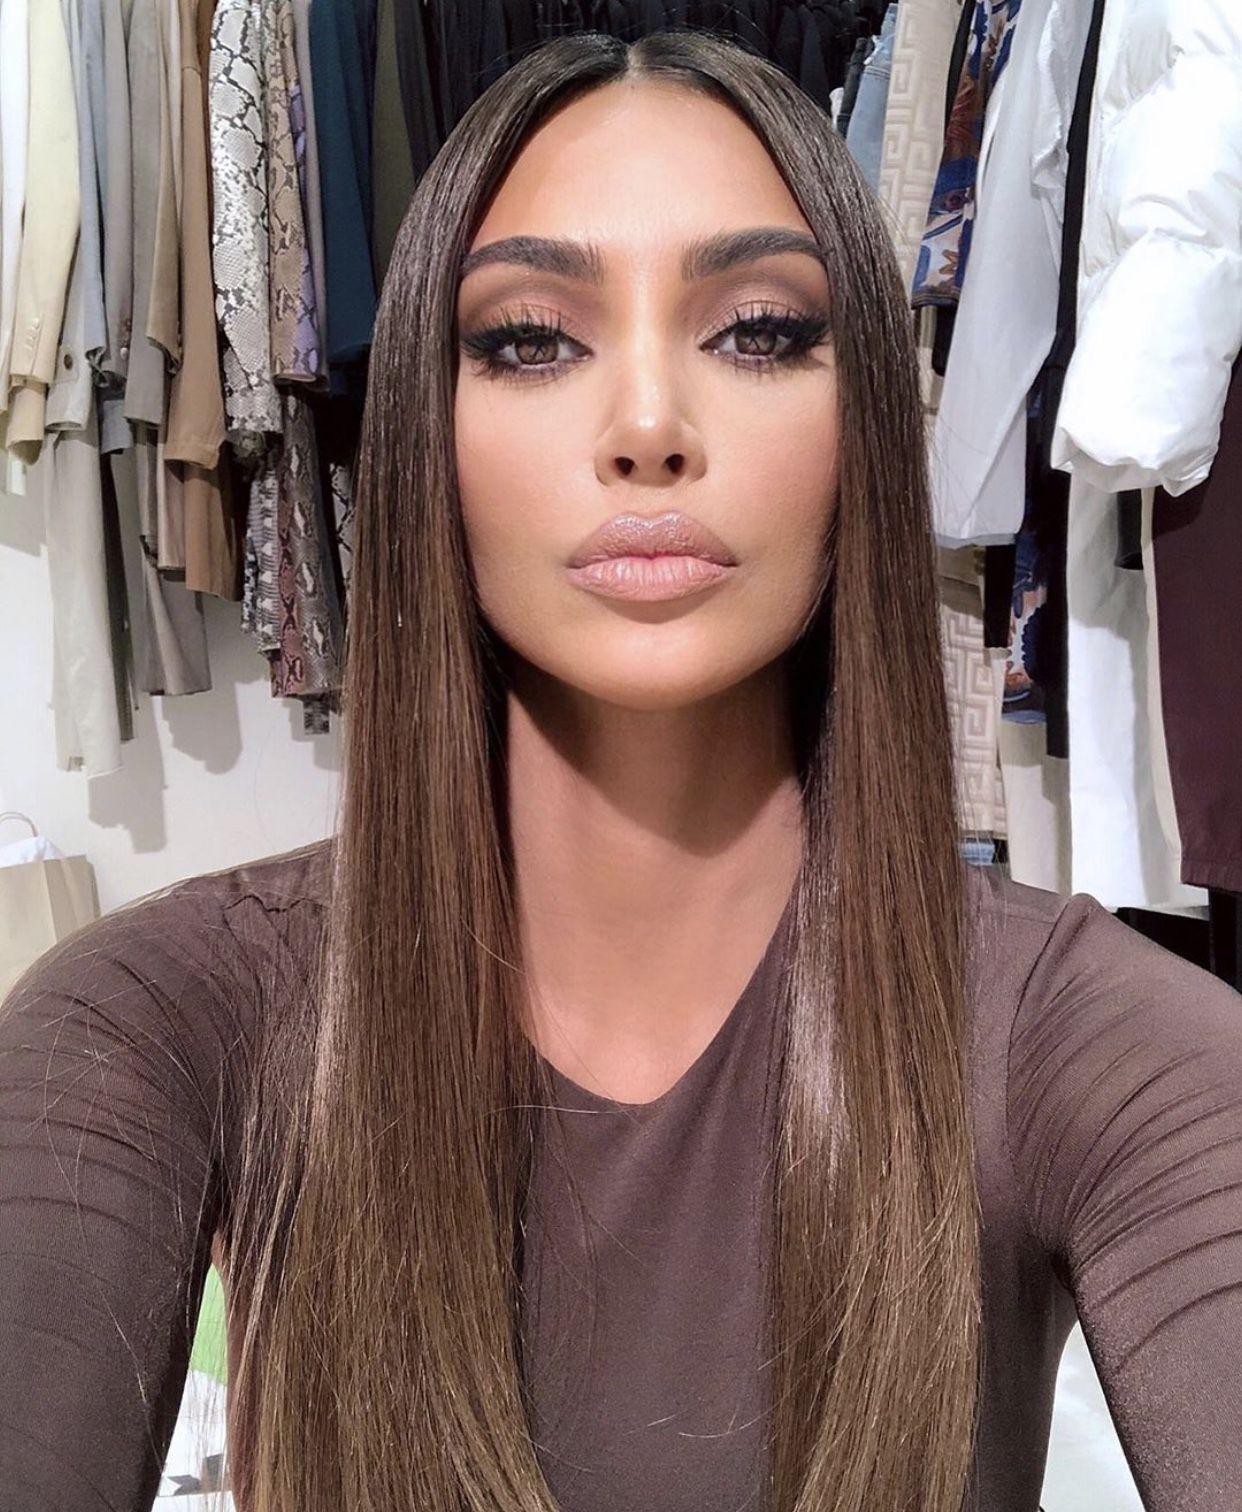 Cool chocolate brown | Kim kardashian hair, Kardashian ...